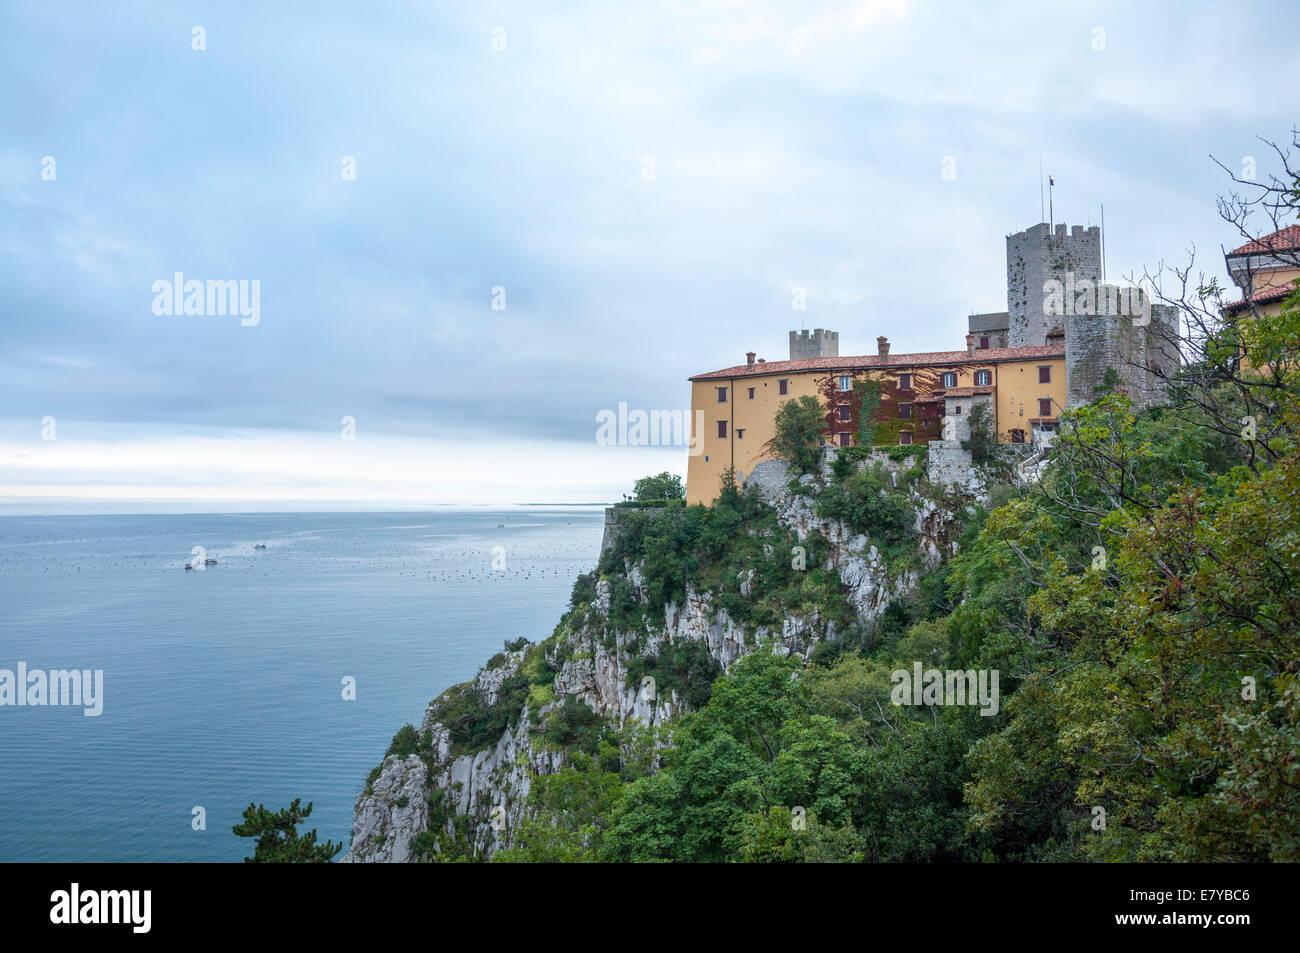 Castello di Duino castle on Adriatic coast of Italy - Stock Image